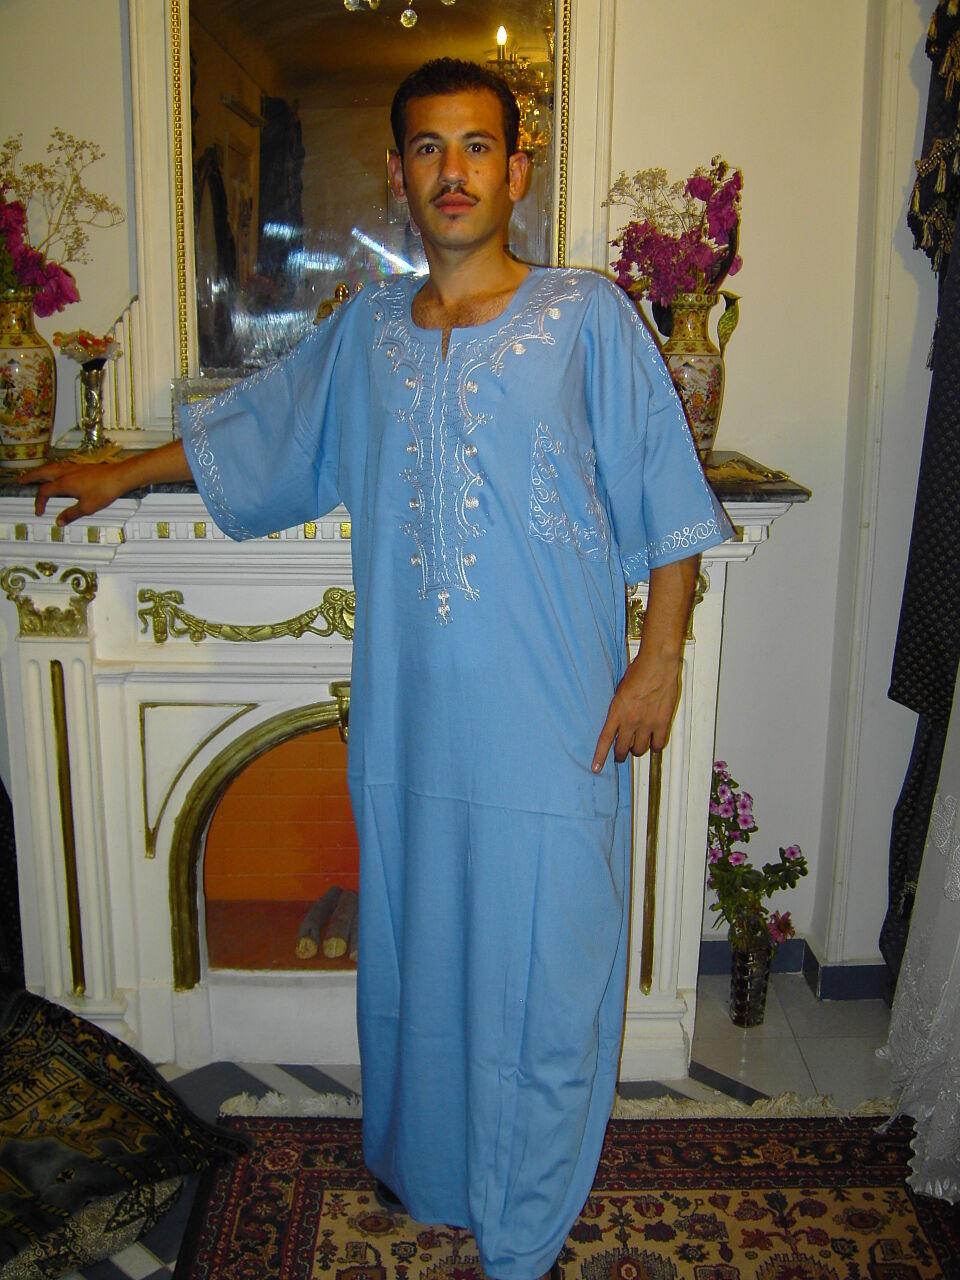 Beautiful Elegant Modern Men's Caftan Aus1001 Night Light bluee Kam00301